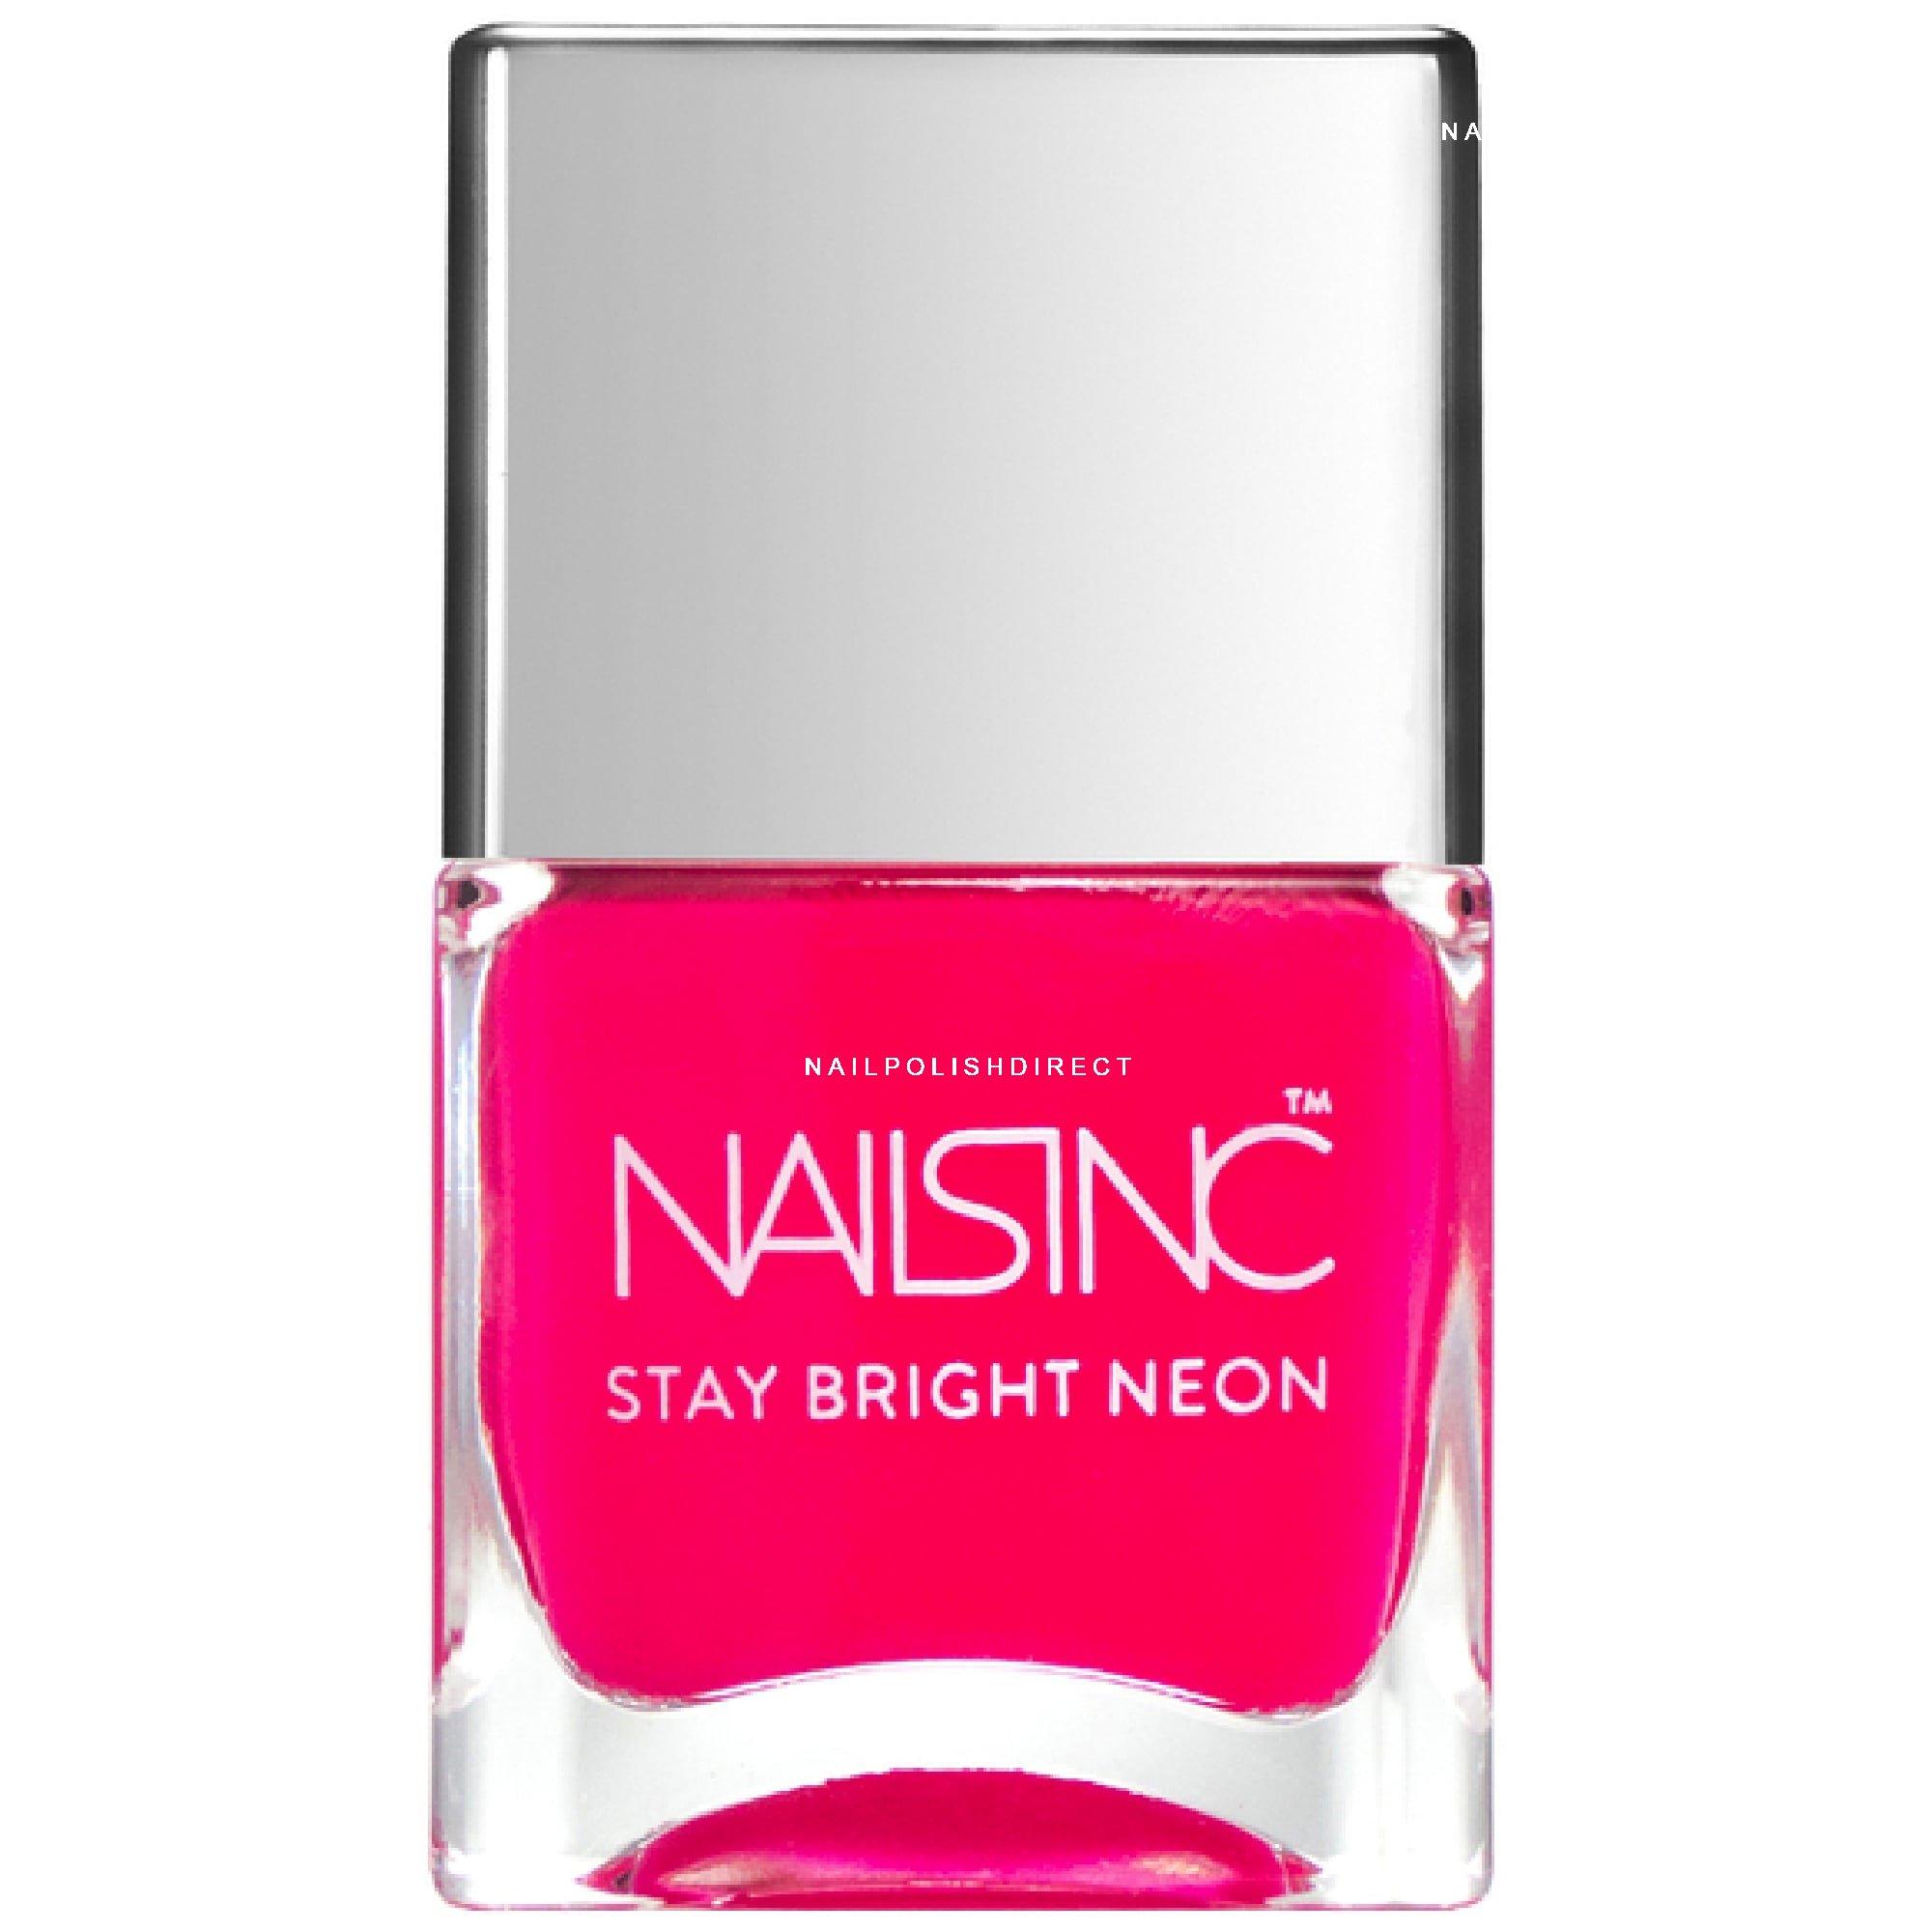 Nails inc Stay Bright Neon Nail Polish - Claridge Gardens (8643) 14ml